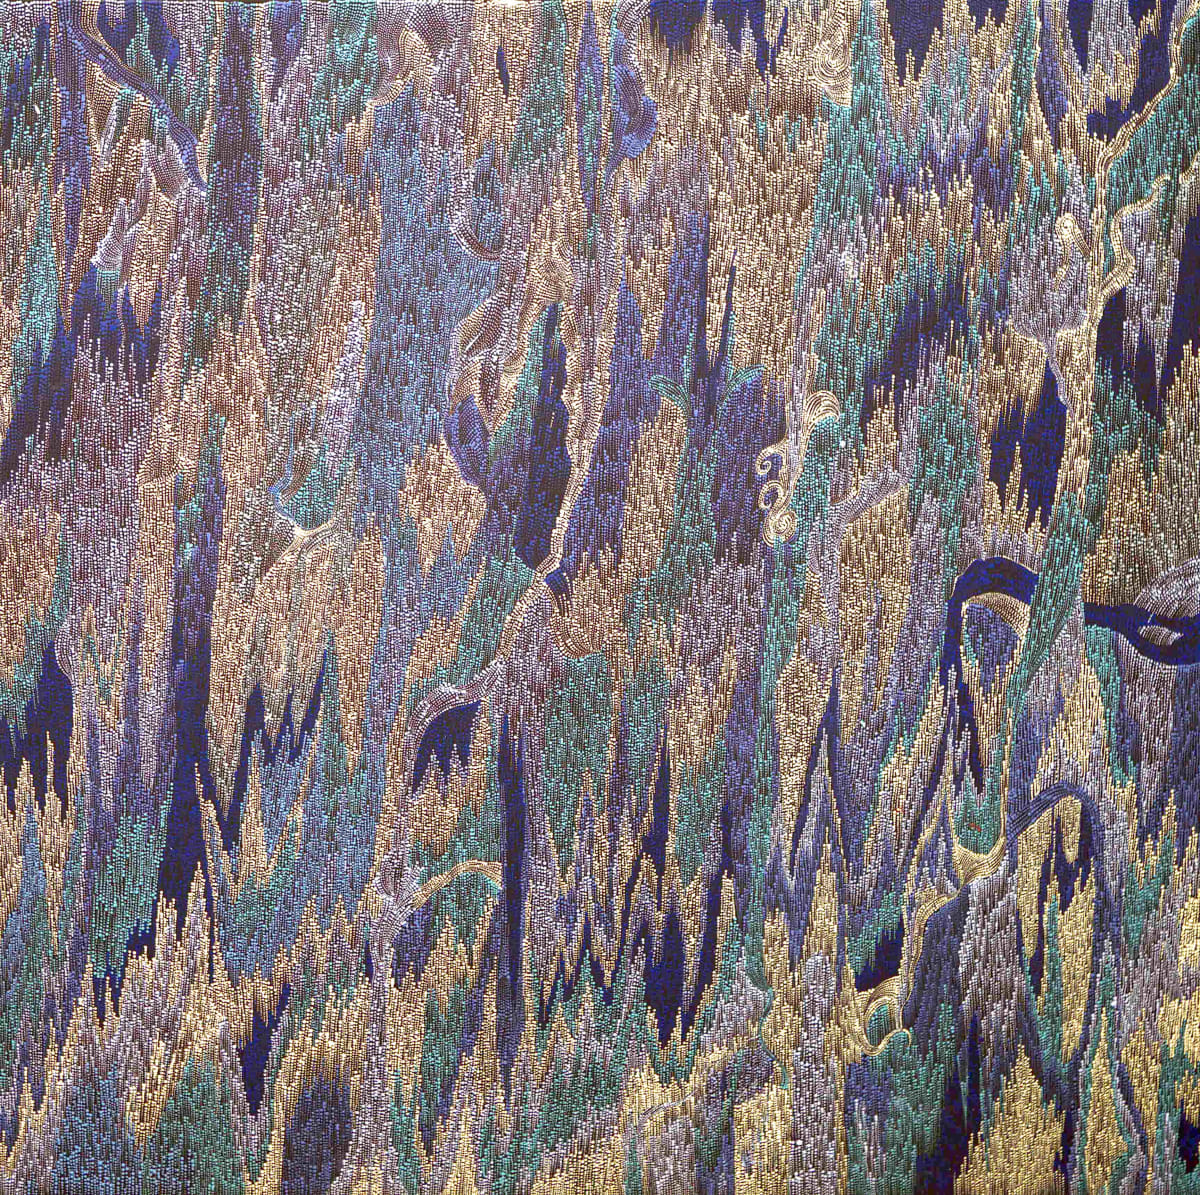 Lynette Lewis Womikata Walka Tali Sand Dune, 2019 Acrylic on Canvas 100x100cm